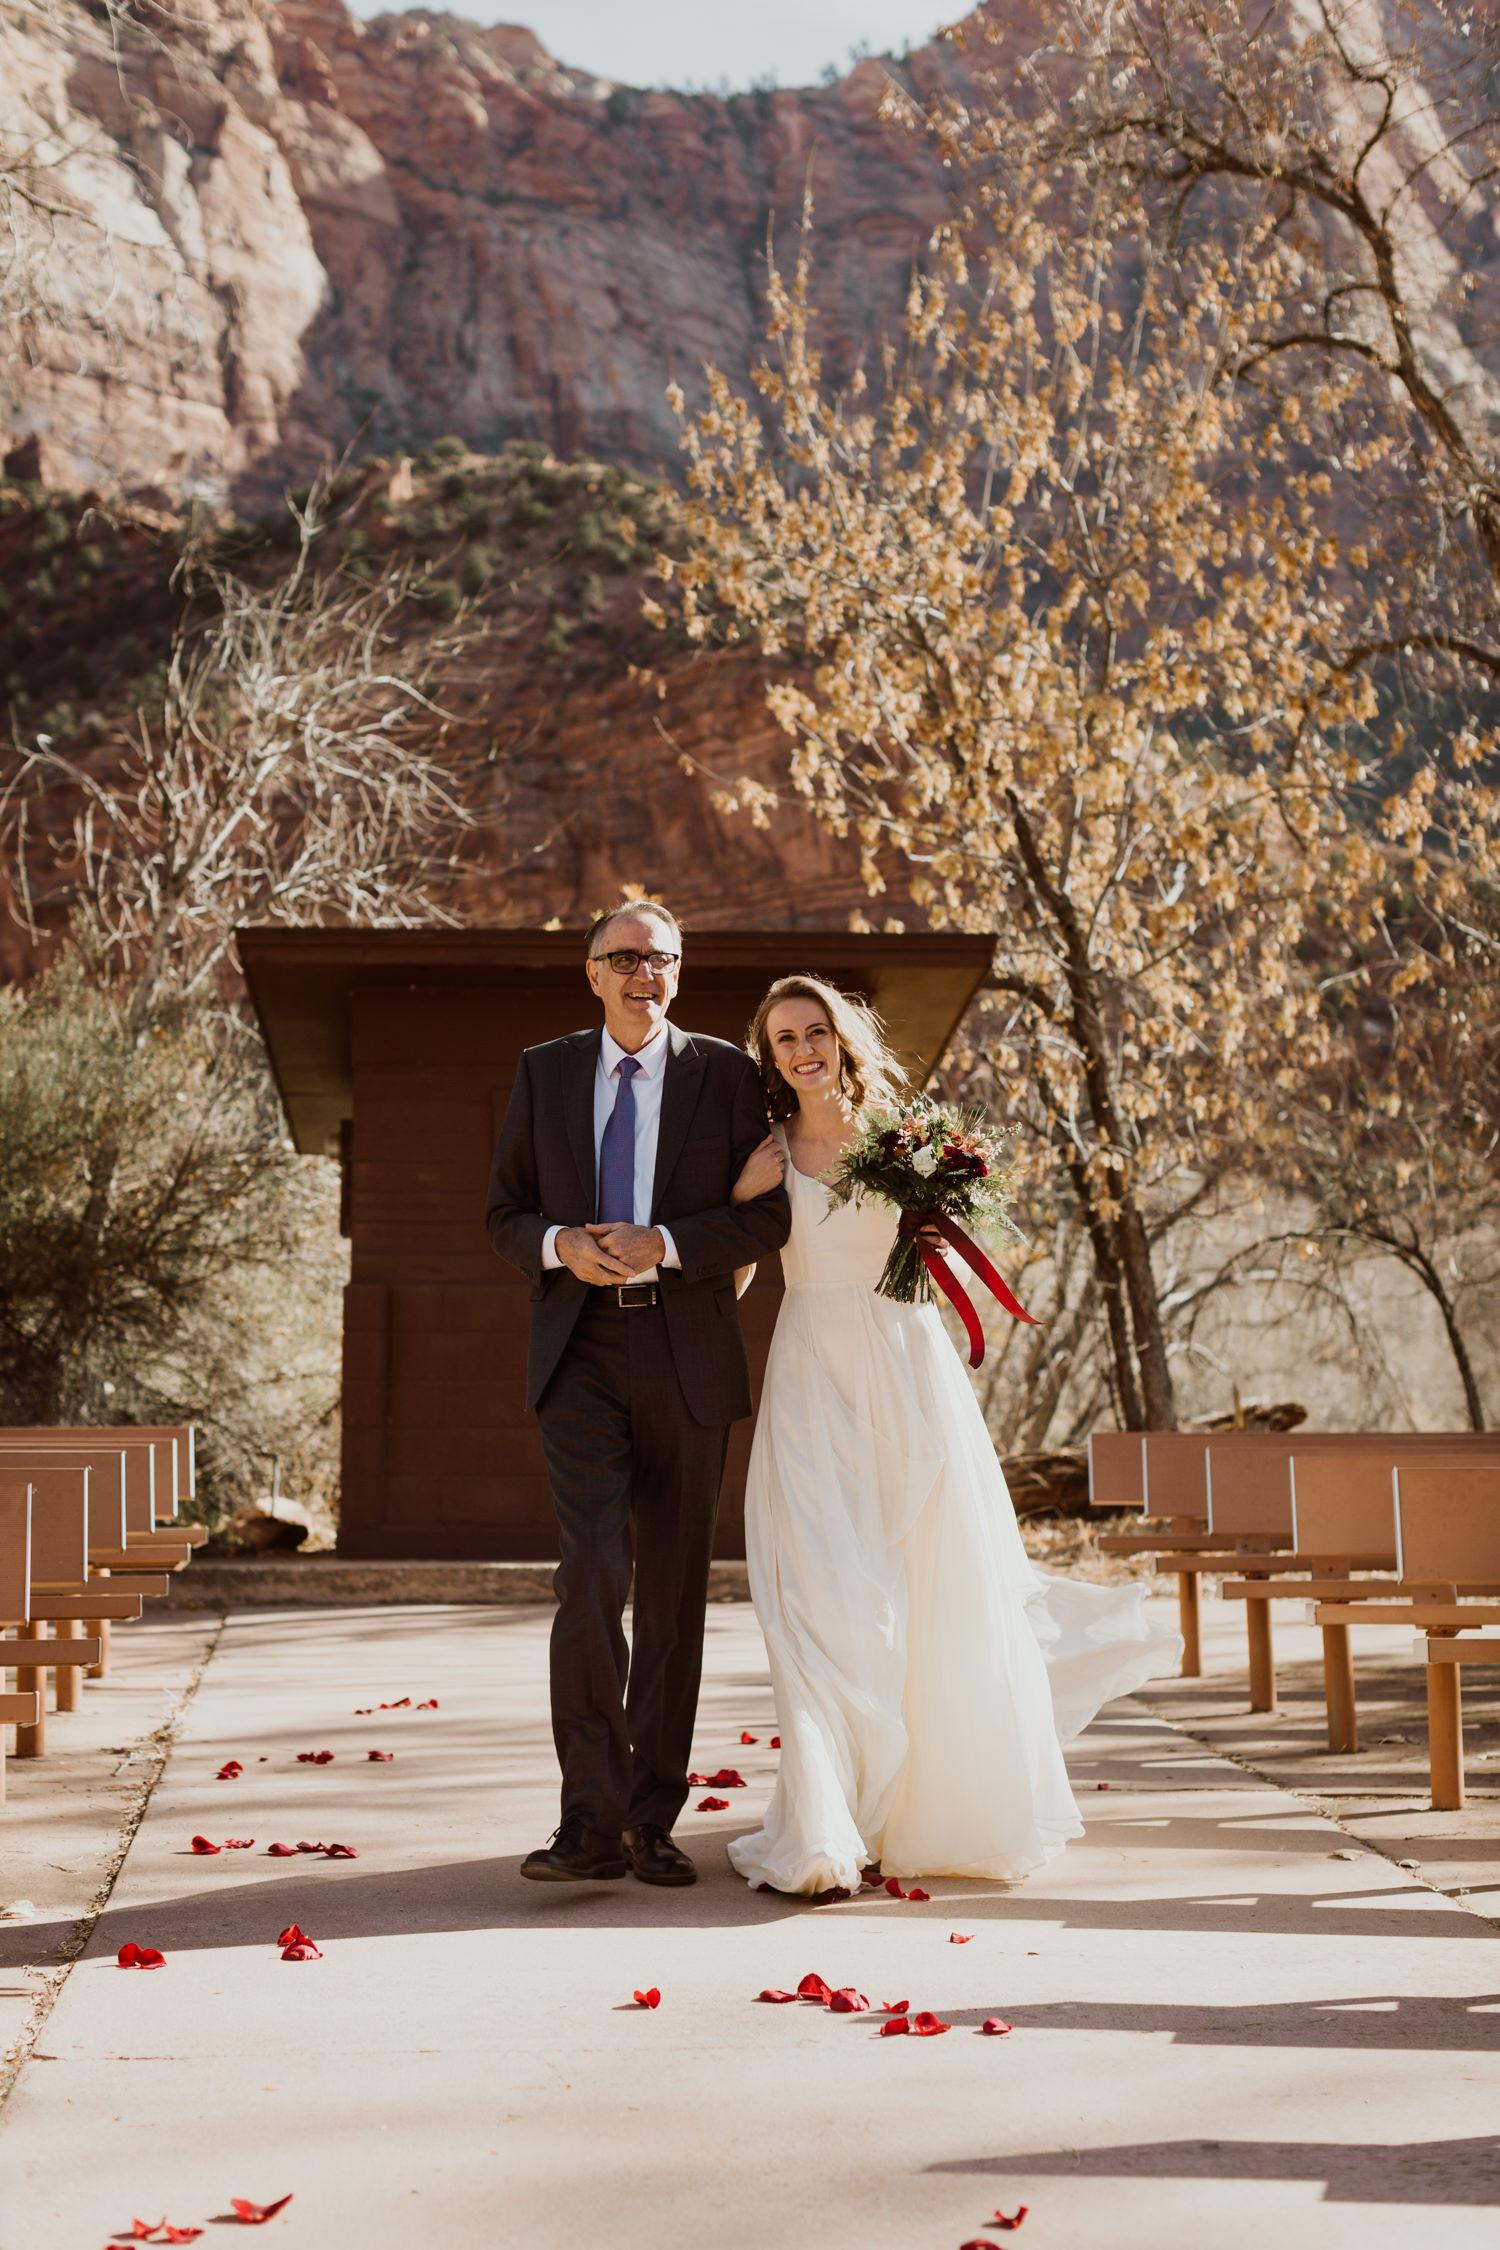 zion-national-park-wedding-74.jpg